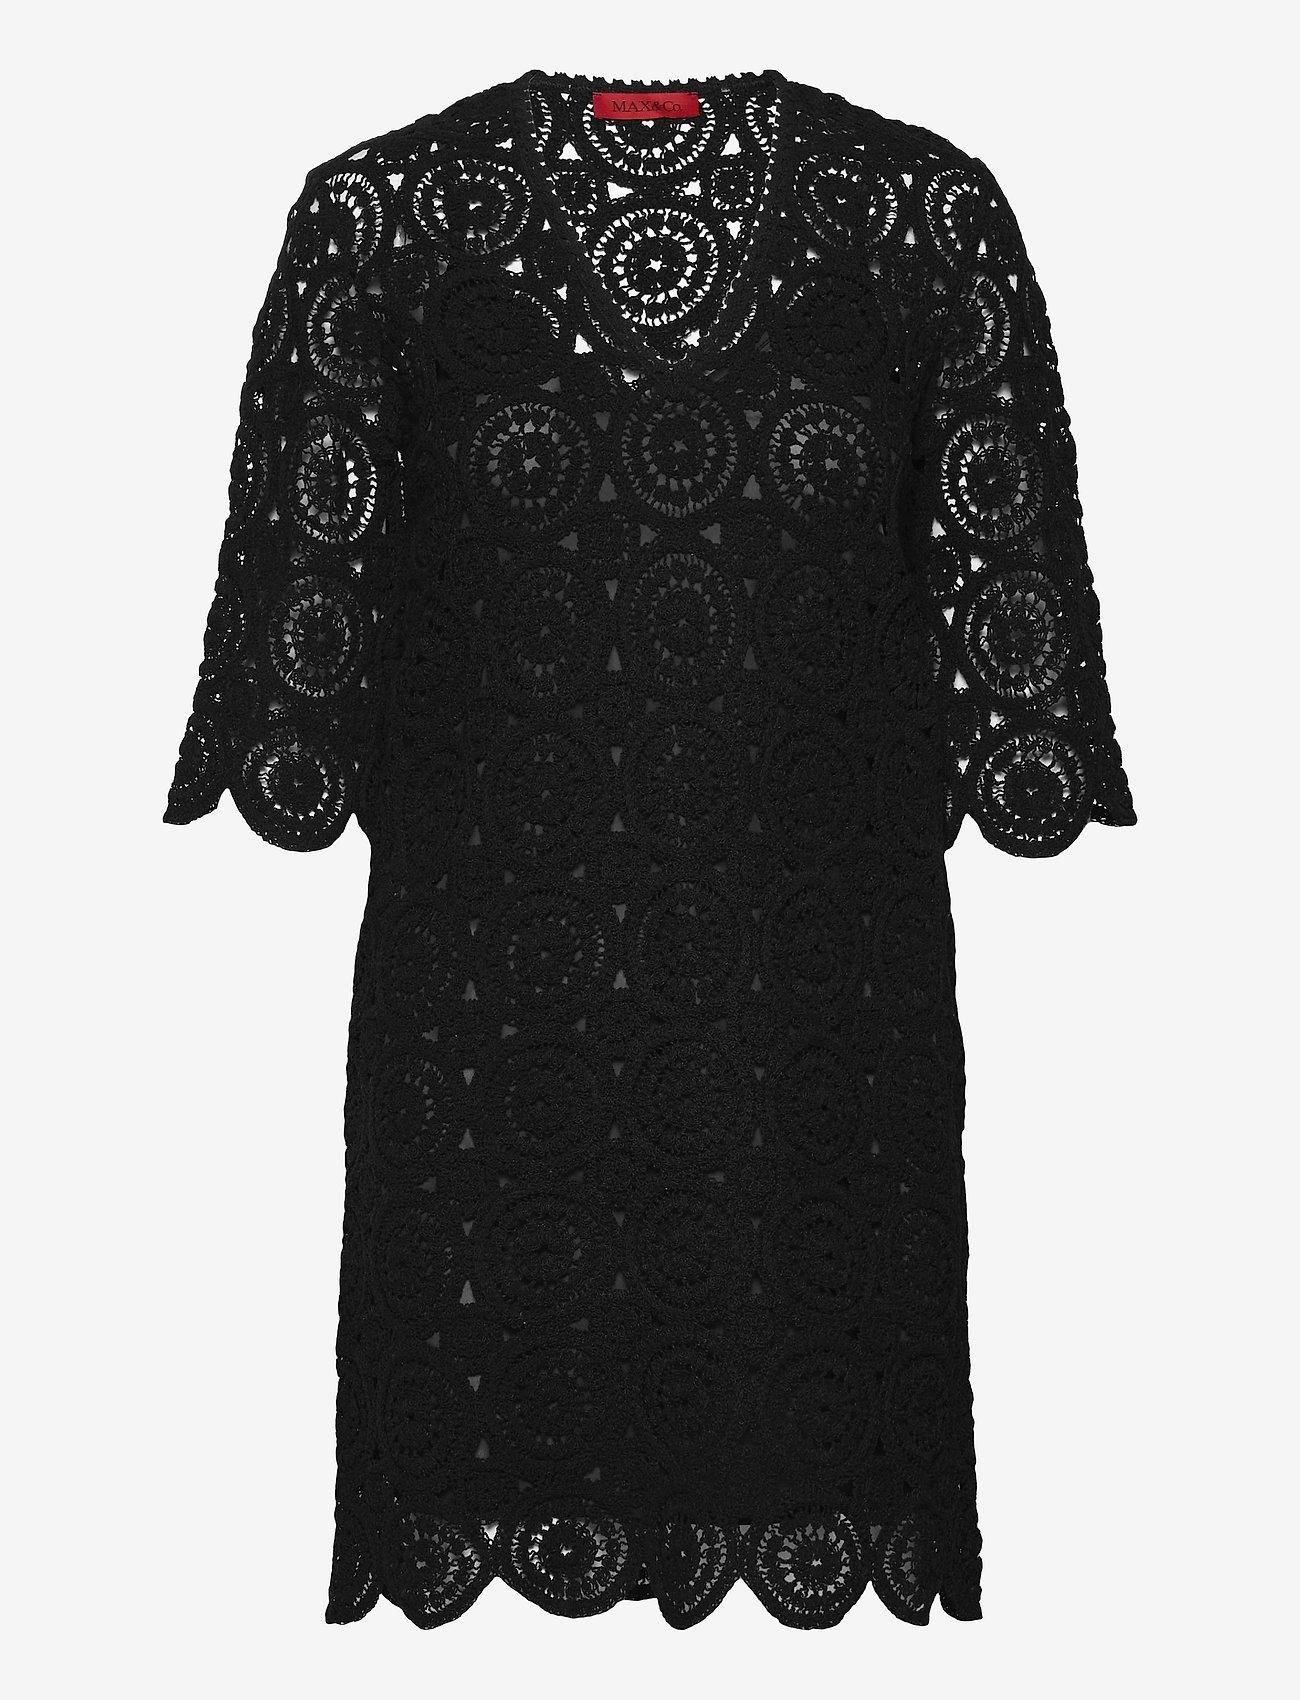 Max&Co. - DARWIN - kanten jurken - black - 0